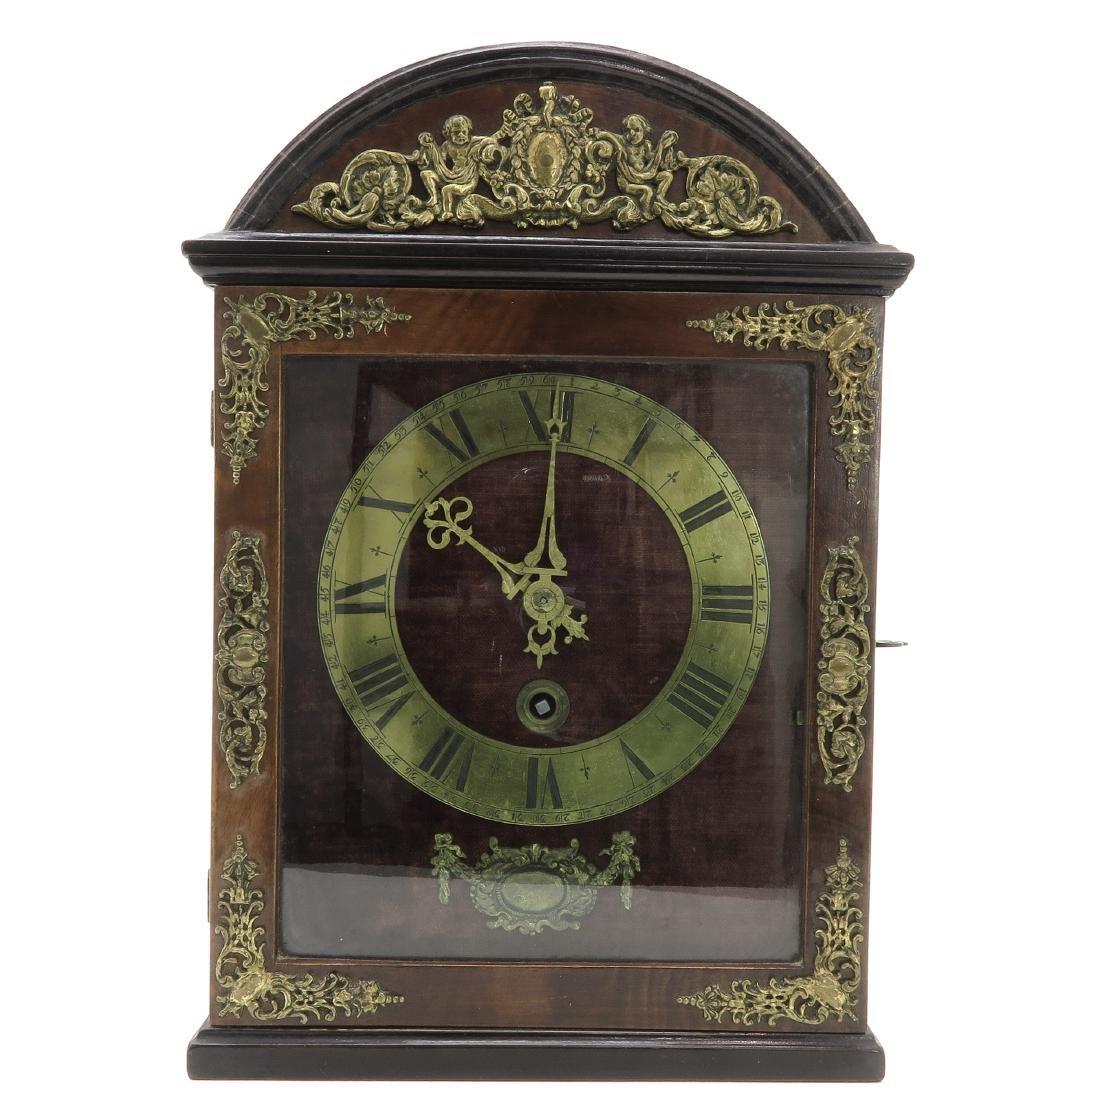 An 18th Century French Religieuze Clock